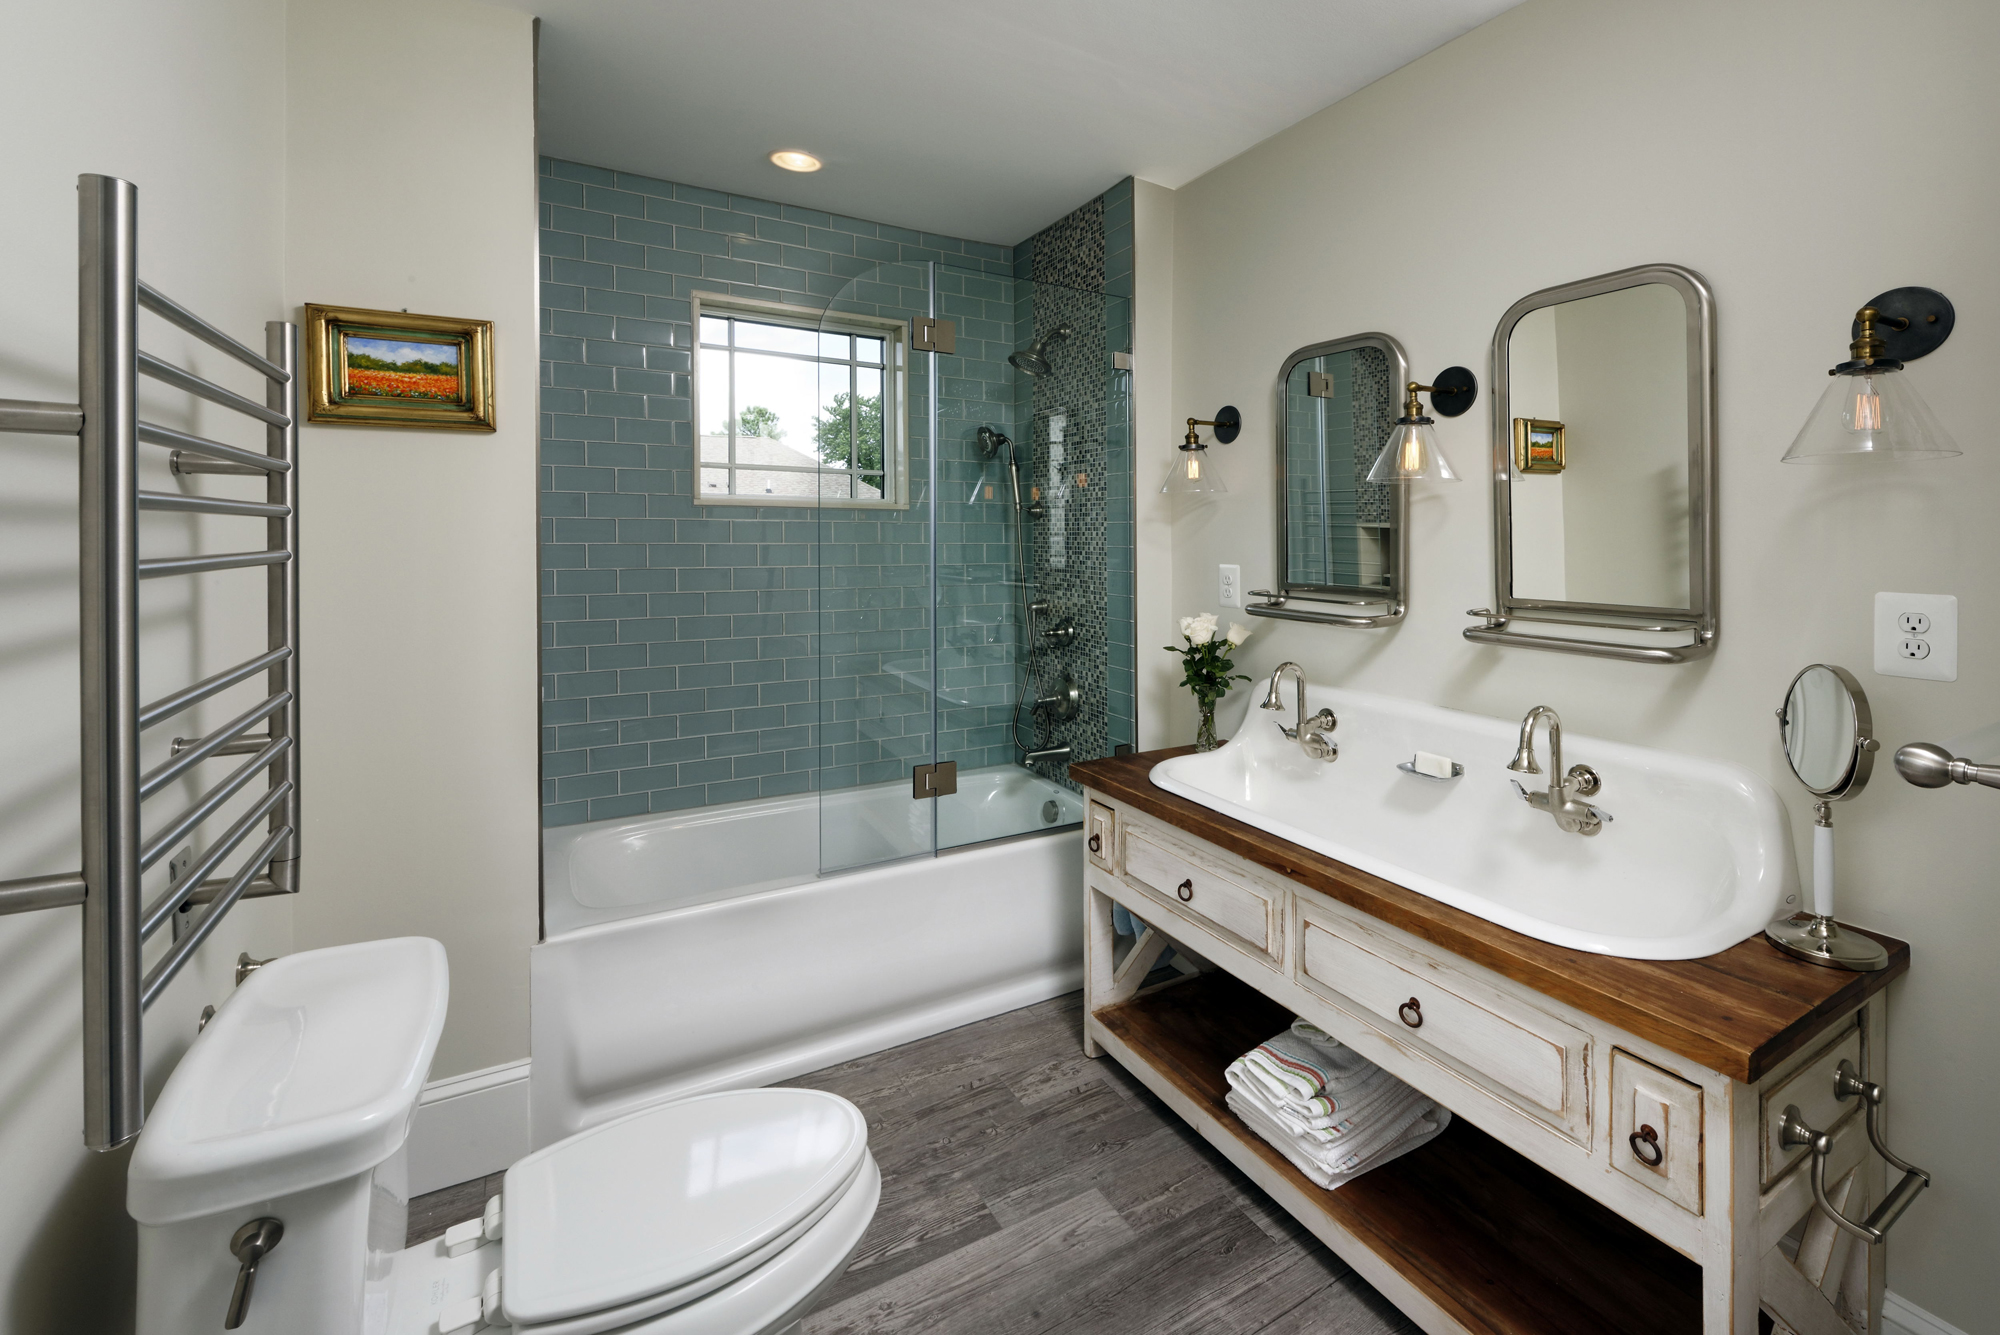 Master Baths & Bathrooms Photos Gallery